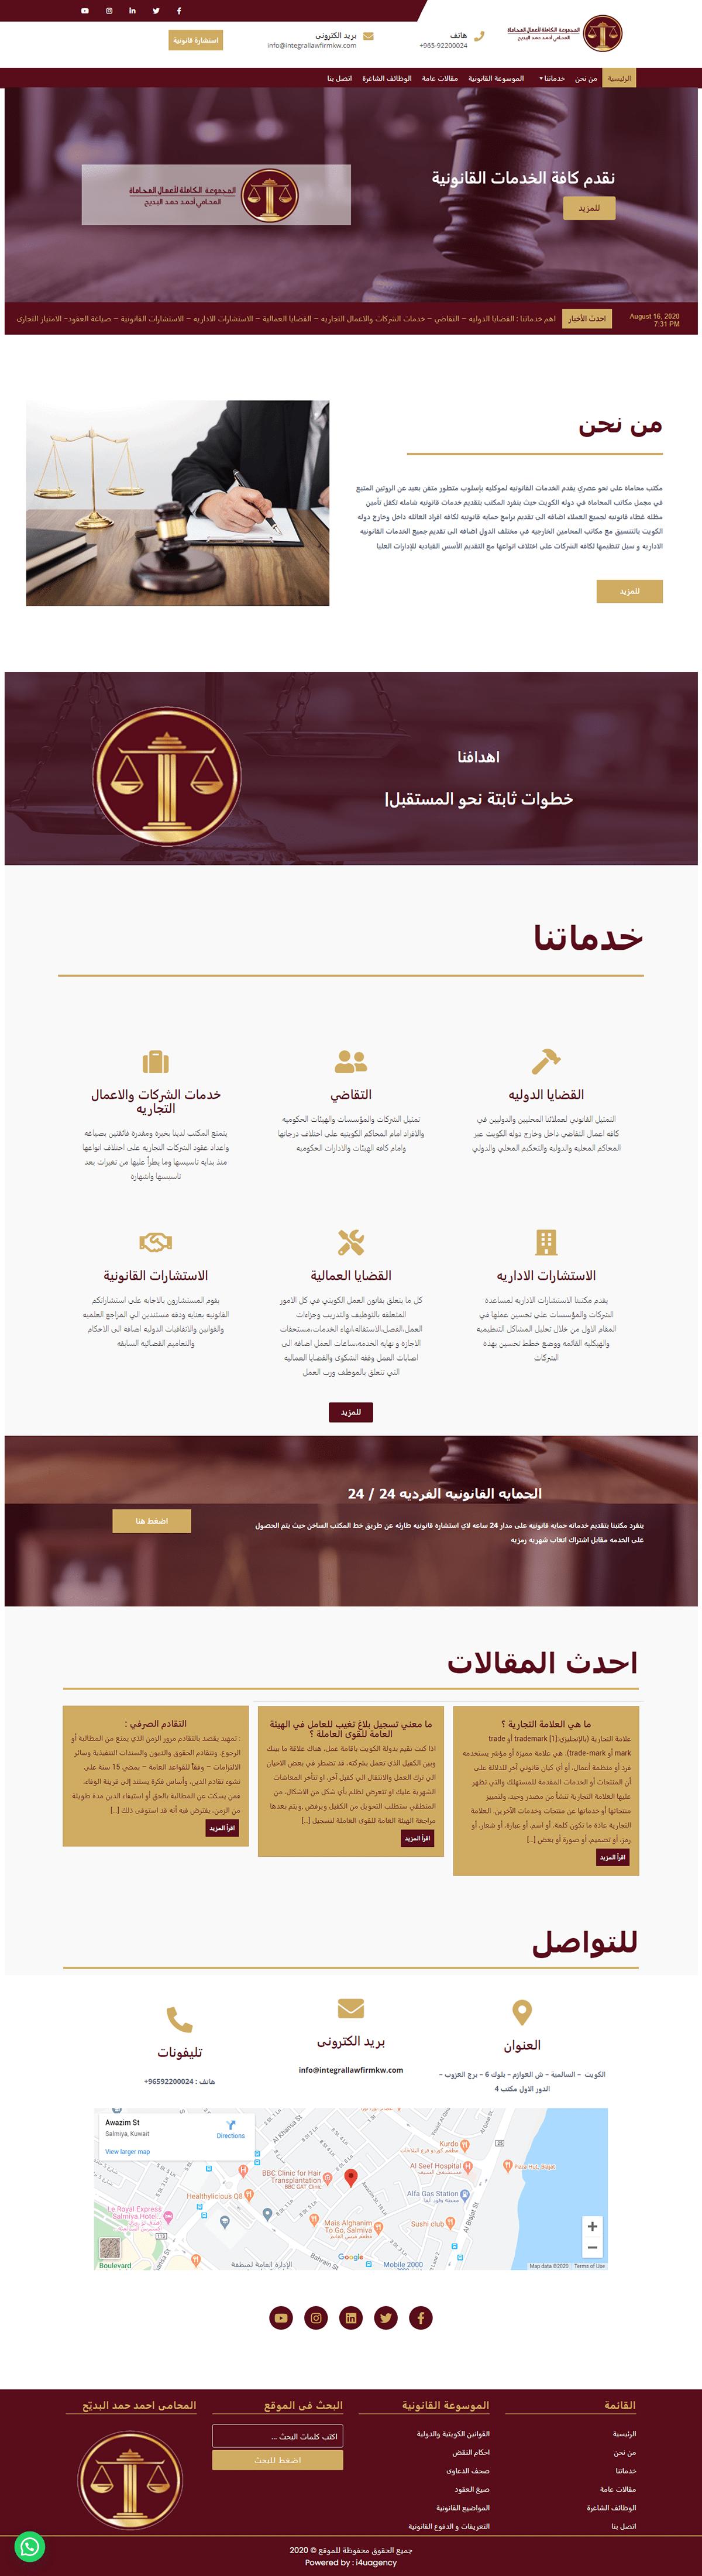 web development  Webdesign Website Ecommerce ecommerce website online store